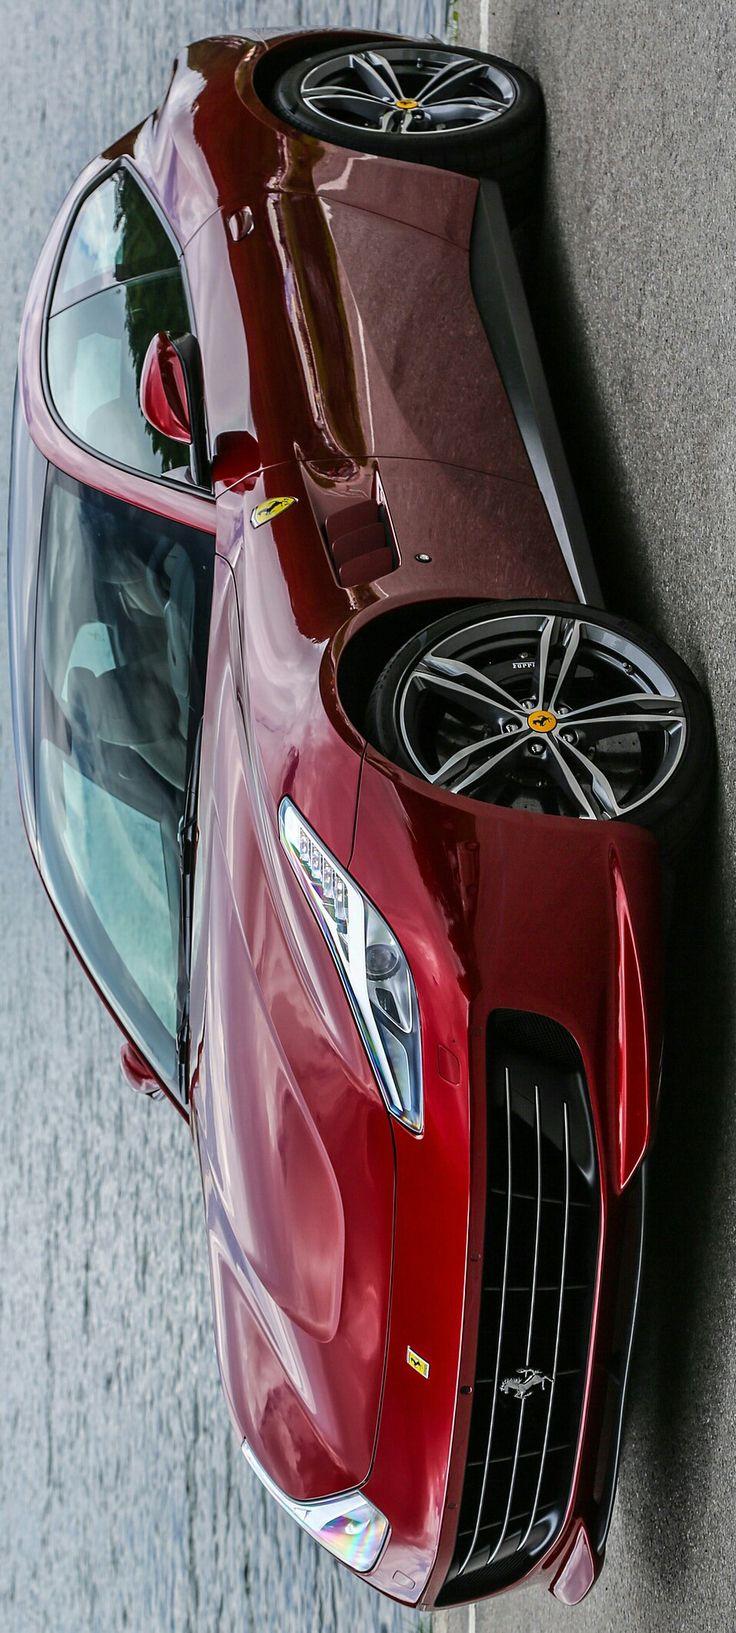 2017 Ferrari GTC4Lusso by Levon